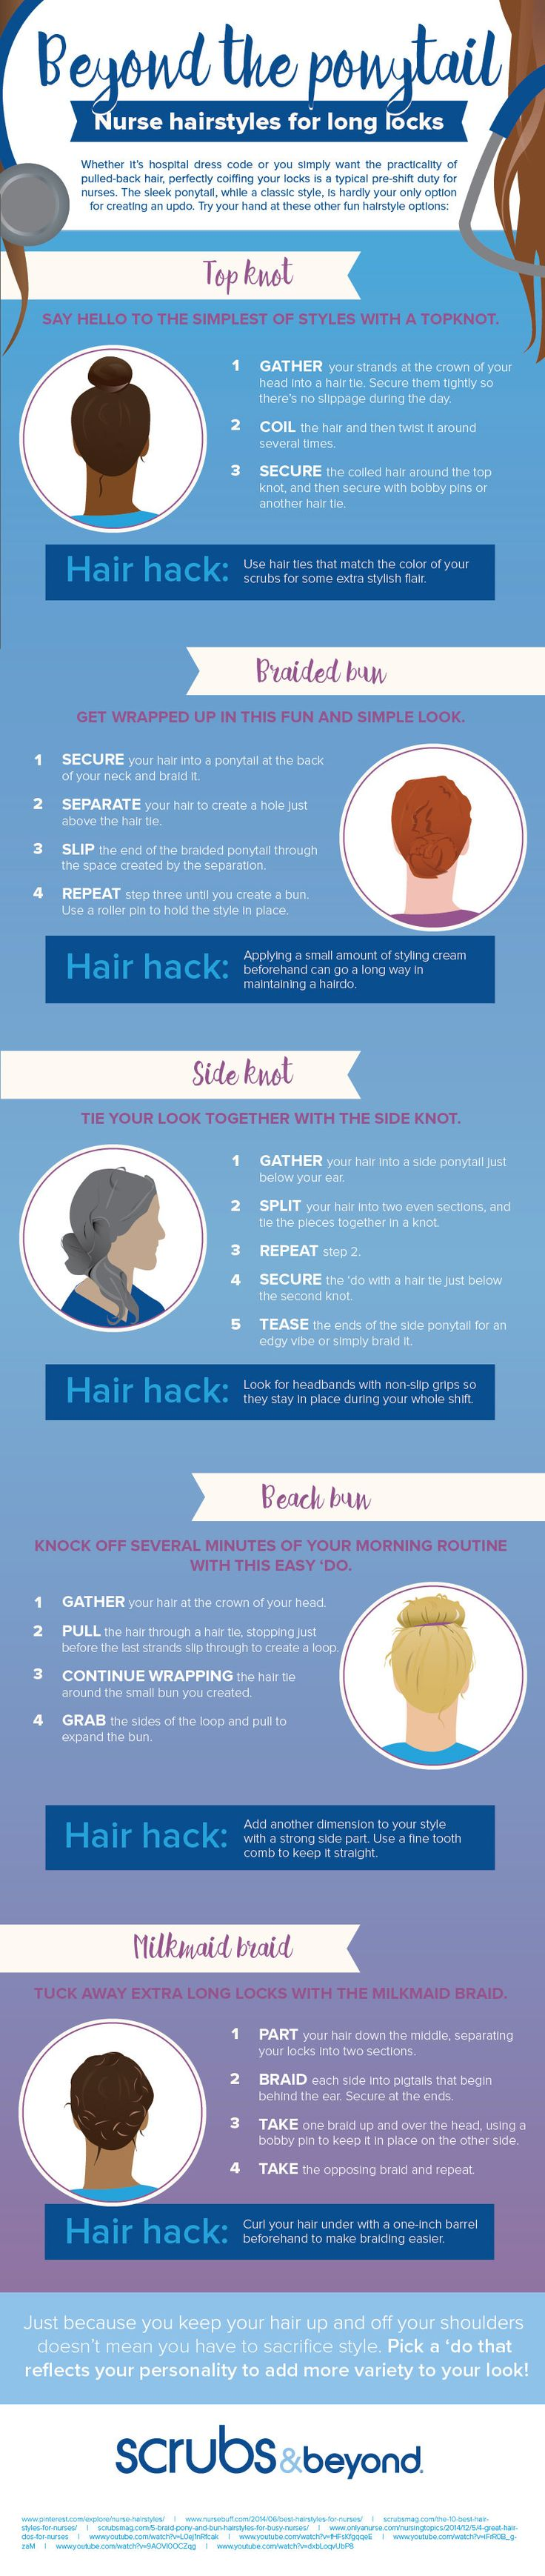 Nurse Hairstyles For Long Locks